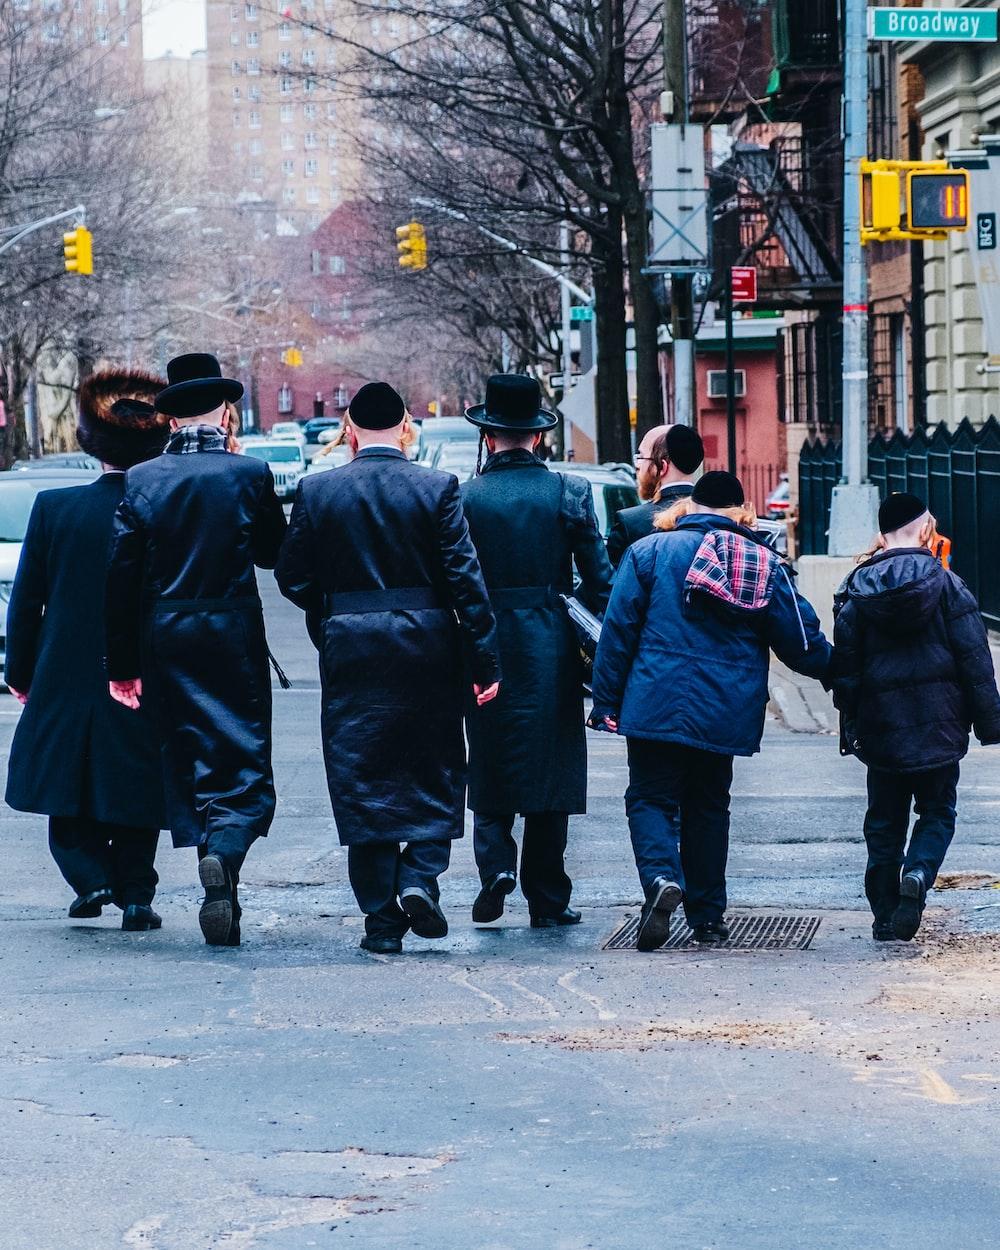 group of men in black coat walking on sidewalk during daytime